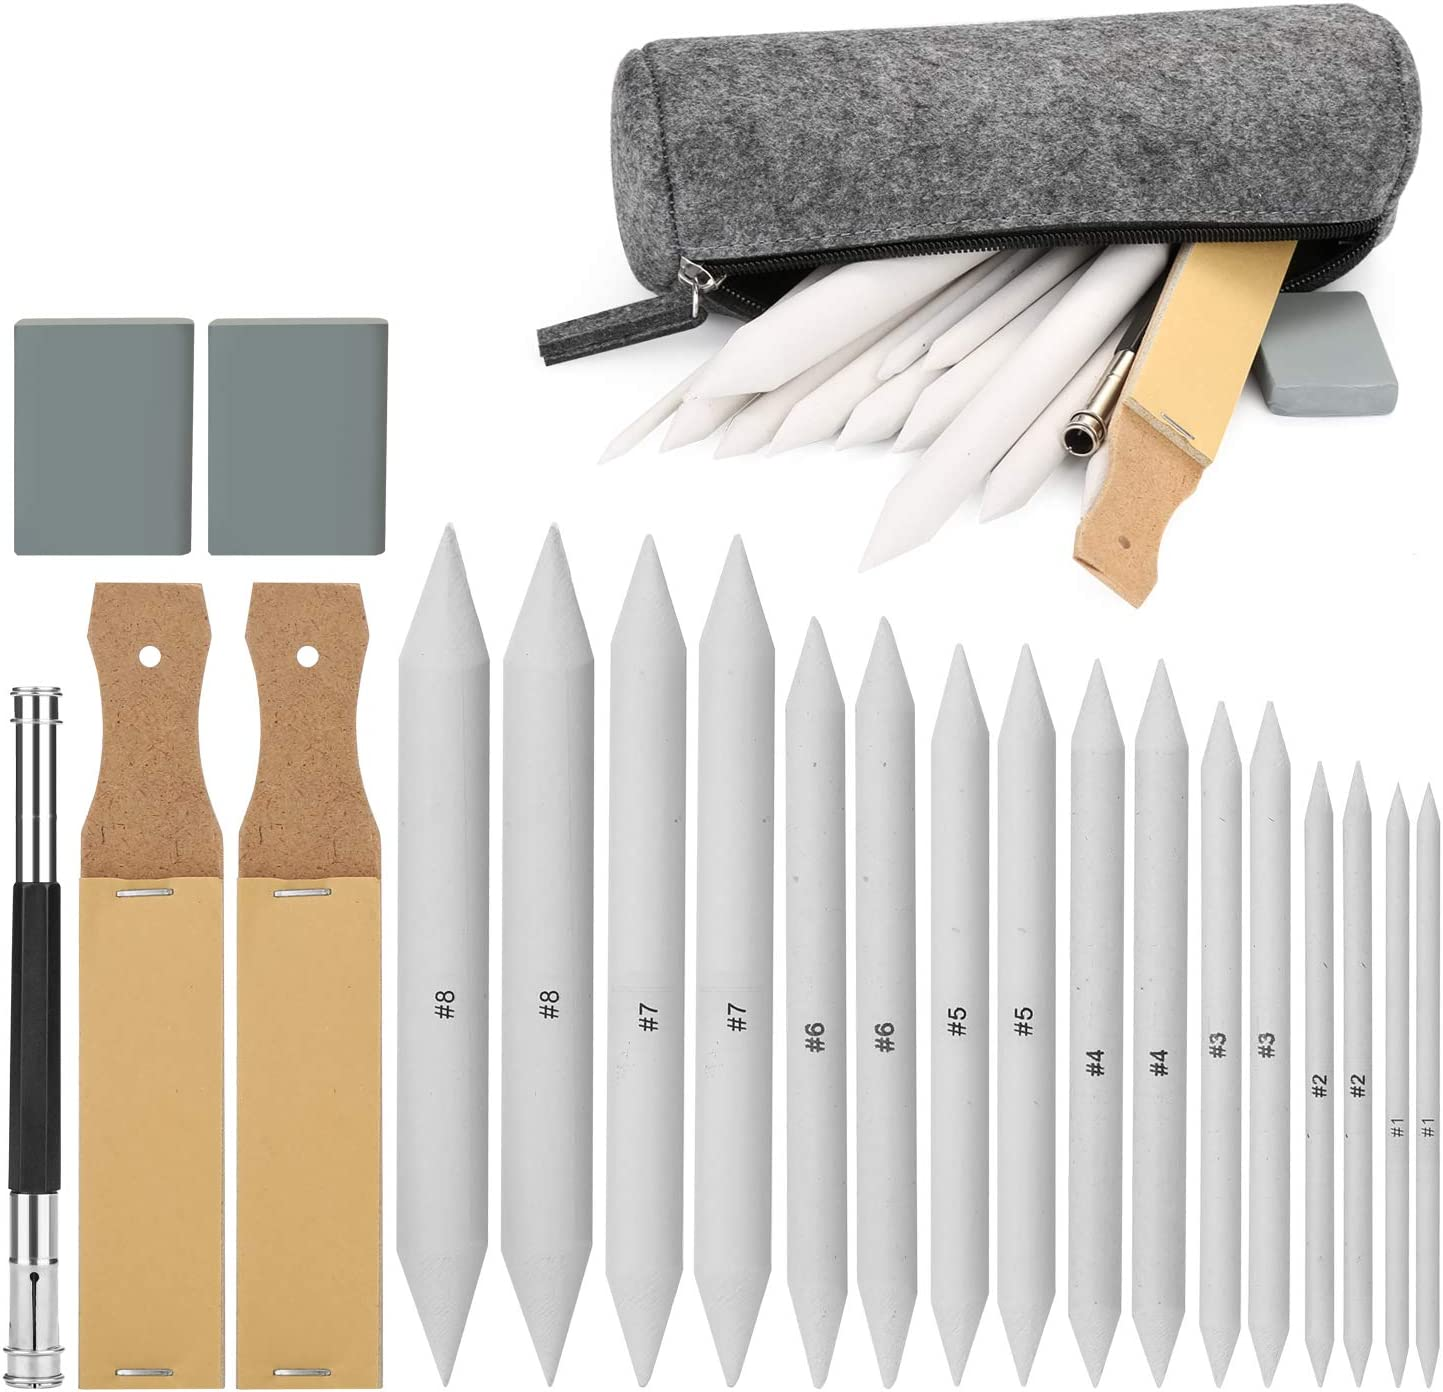 Sketch Drawing Tools, AGPTEK 16 Blending Stumps Set with 2 Sandpaper Pencil Sharpeners, 1 Pencil Extension Tool, 2 Erasers & 1 Felt Bag for Student Sketch Drawing Accessories